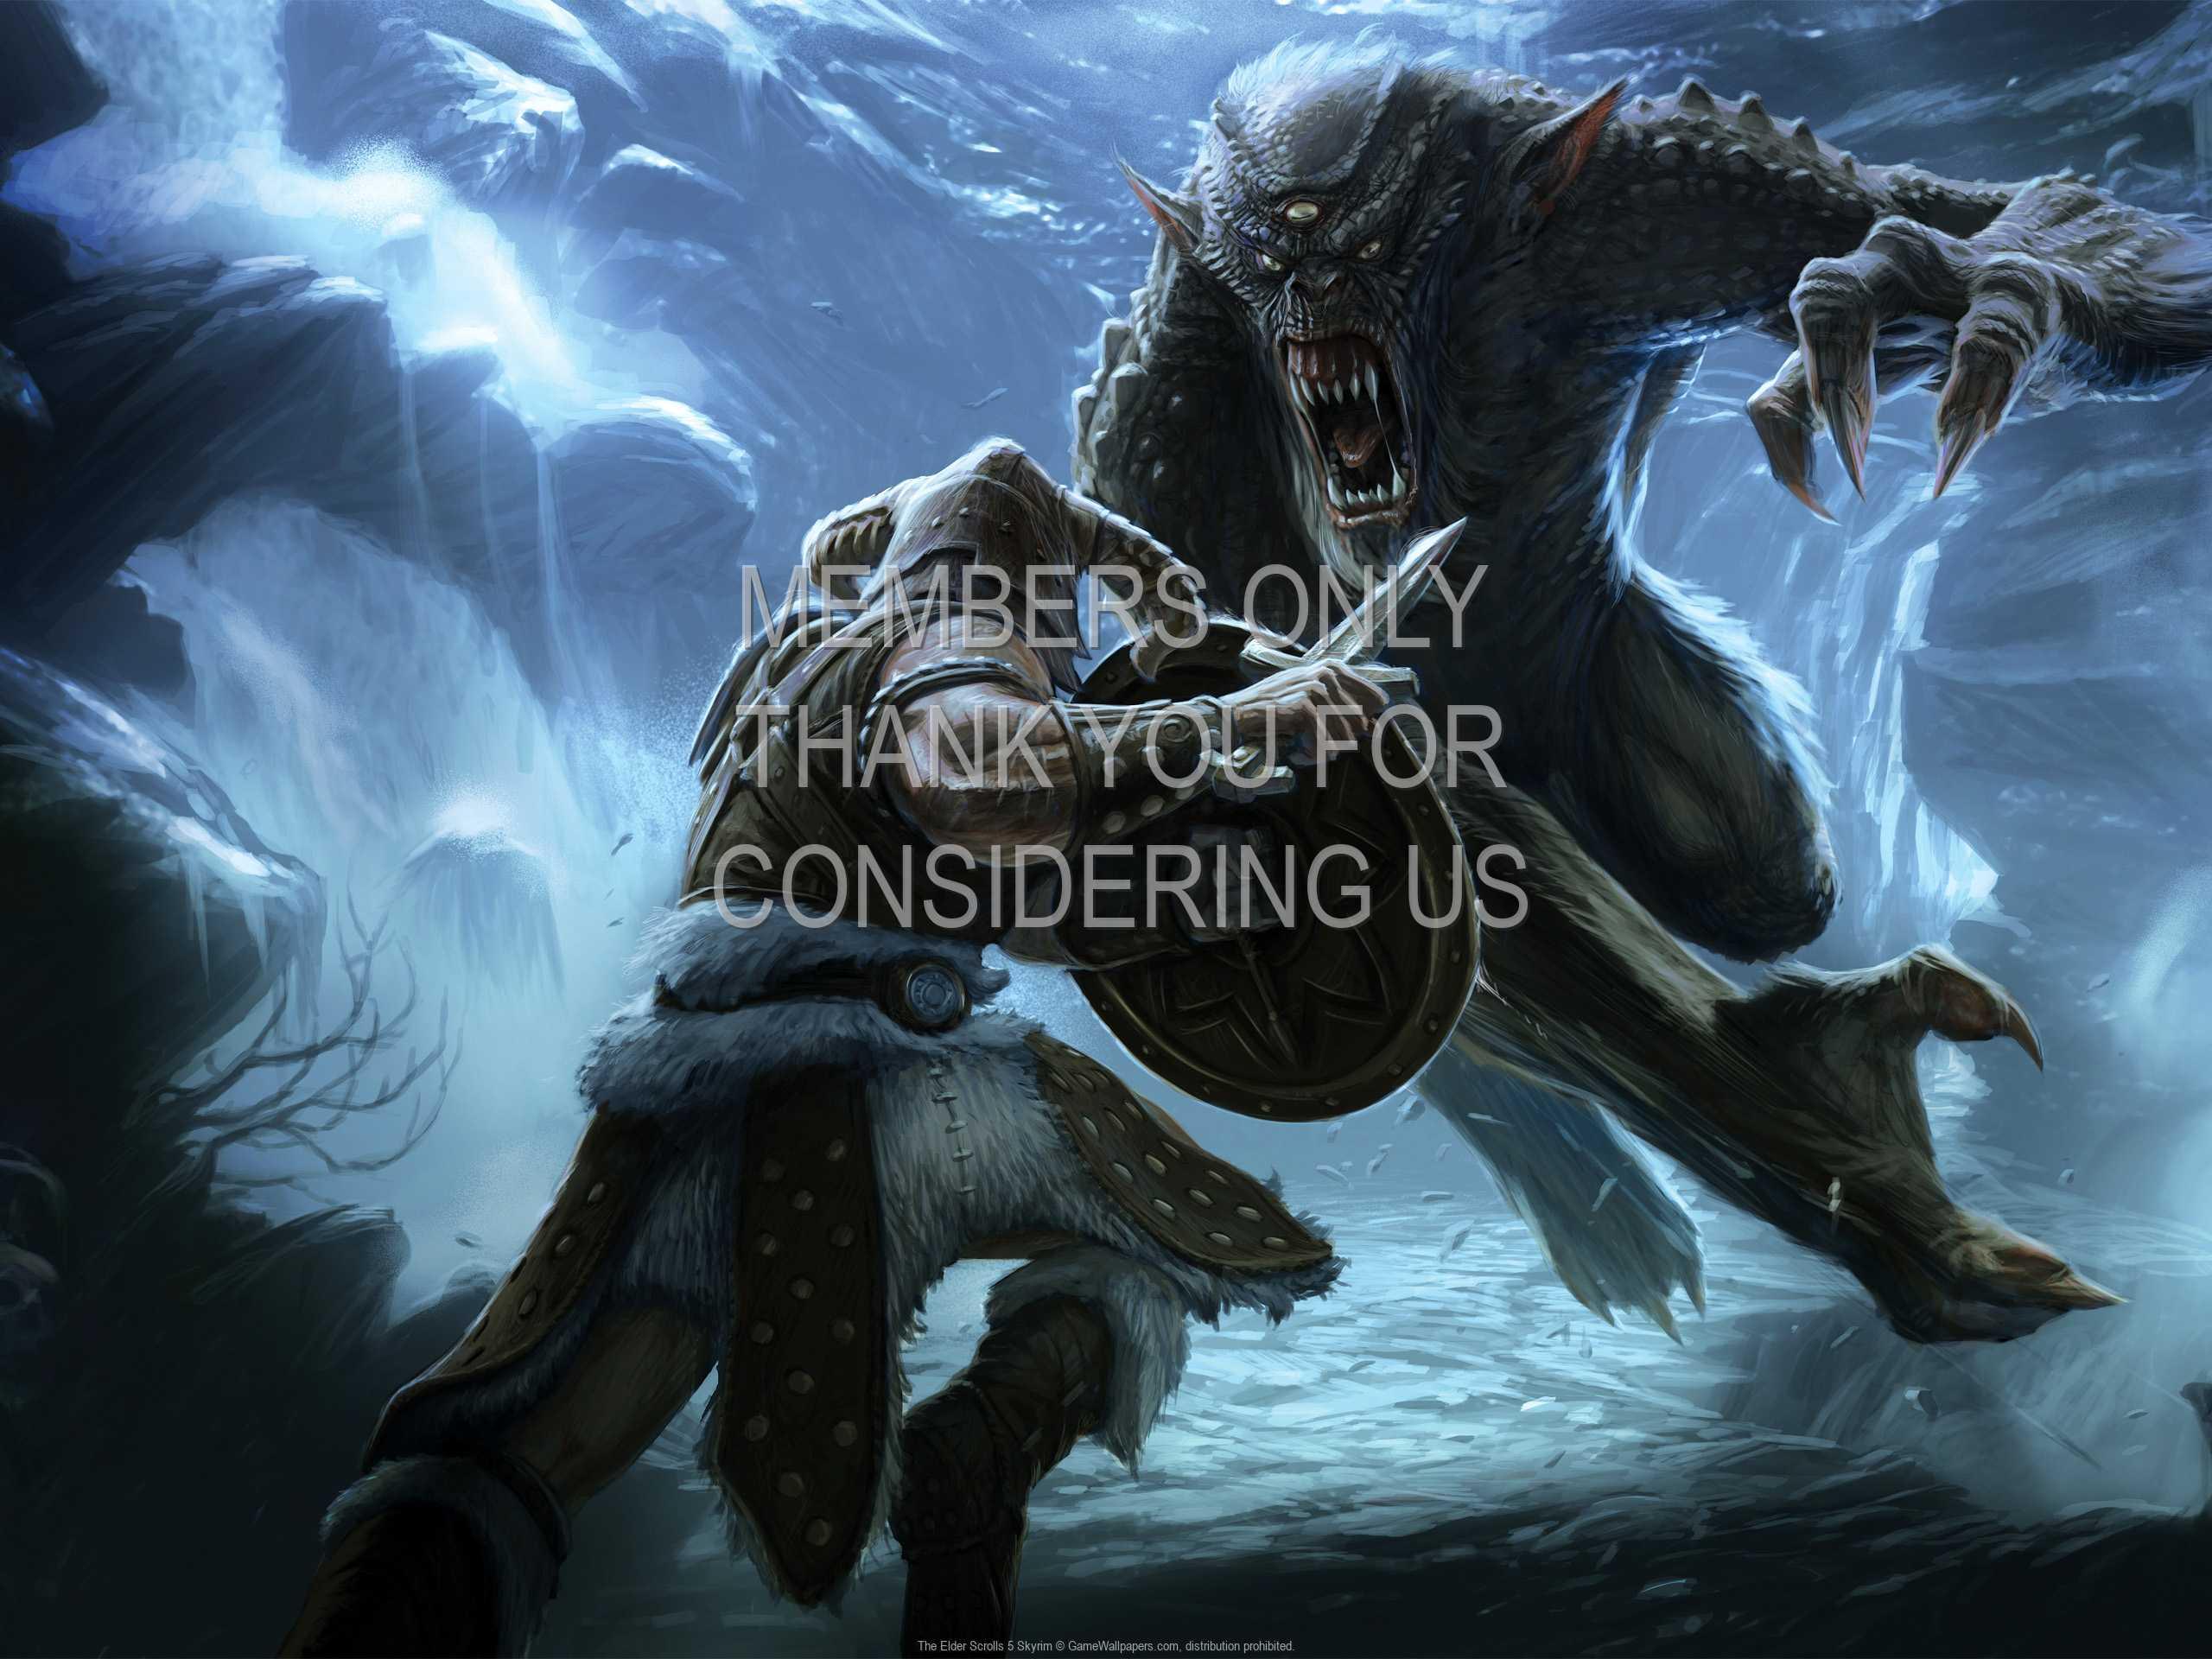 The Elder Scrolls 5: Skyrim 1080p Horizontal Handy Hintergrundbild 09